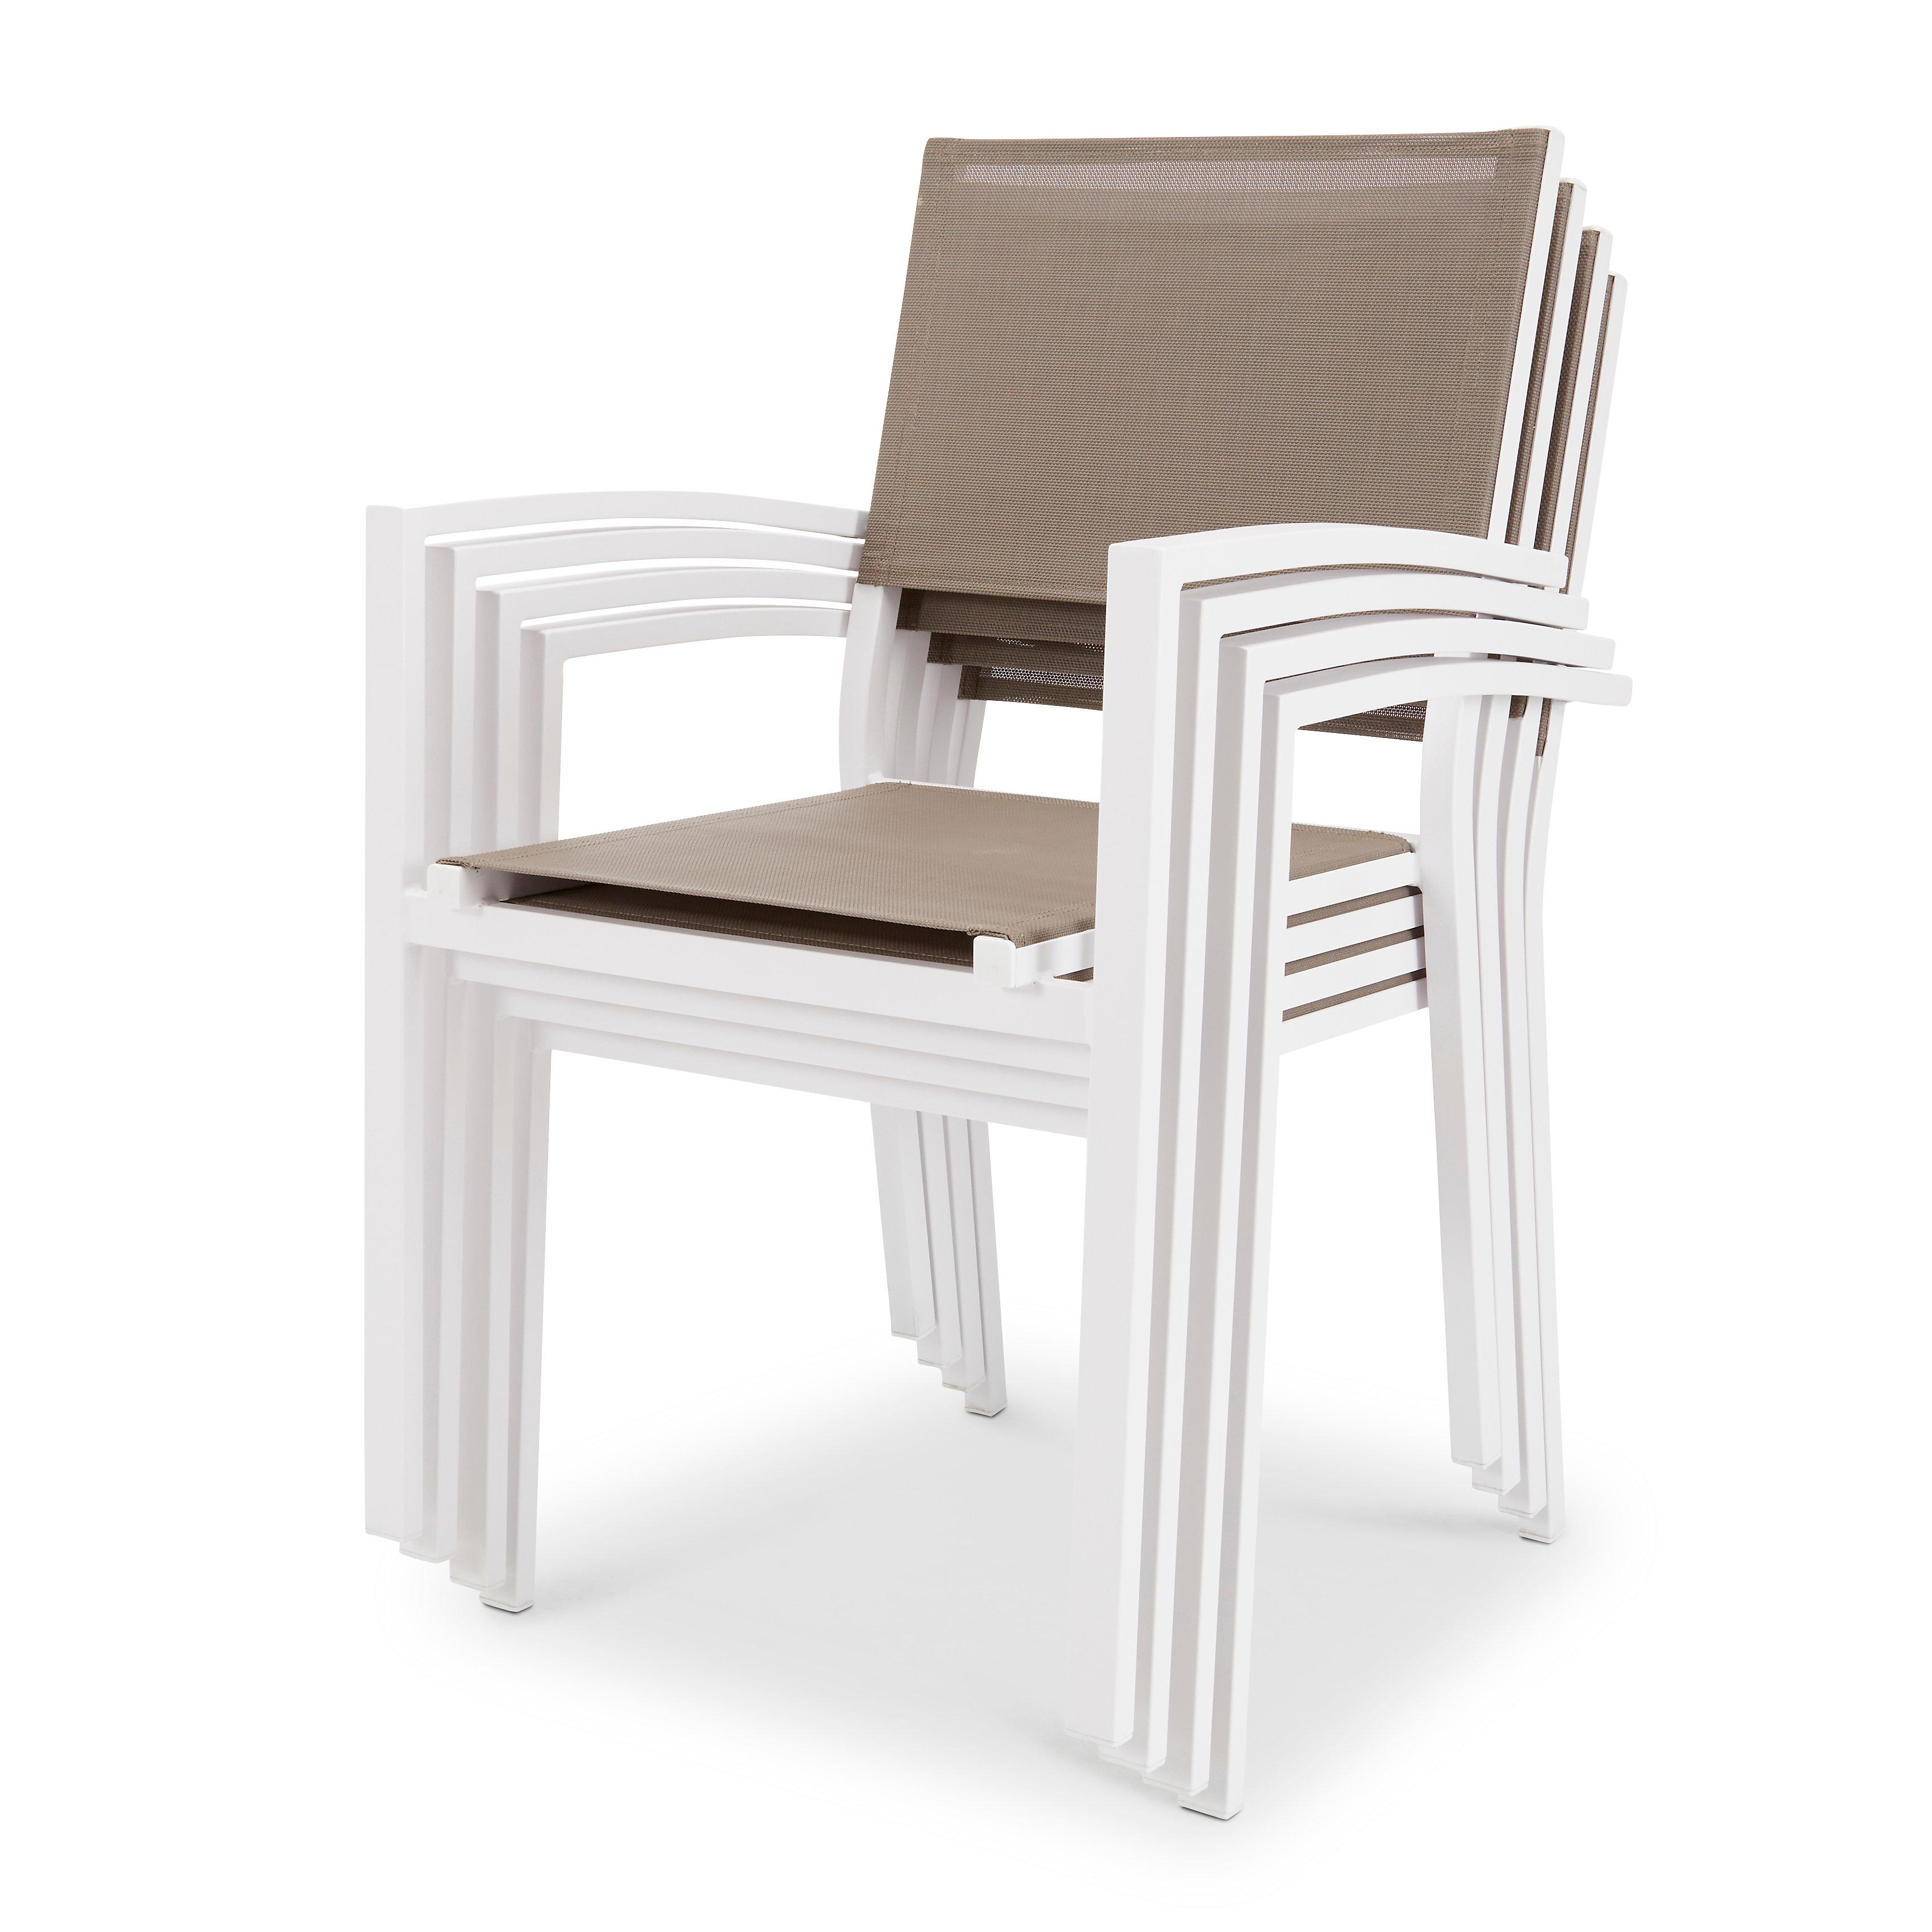 Chaise de jardin Baru